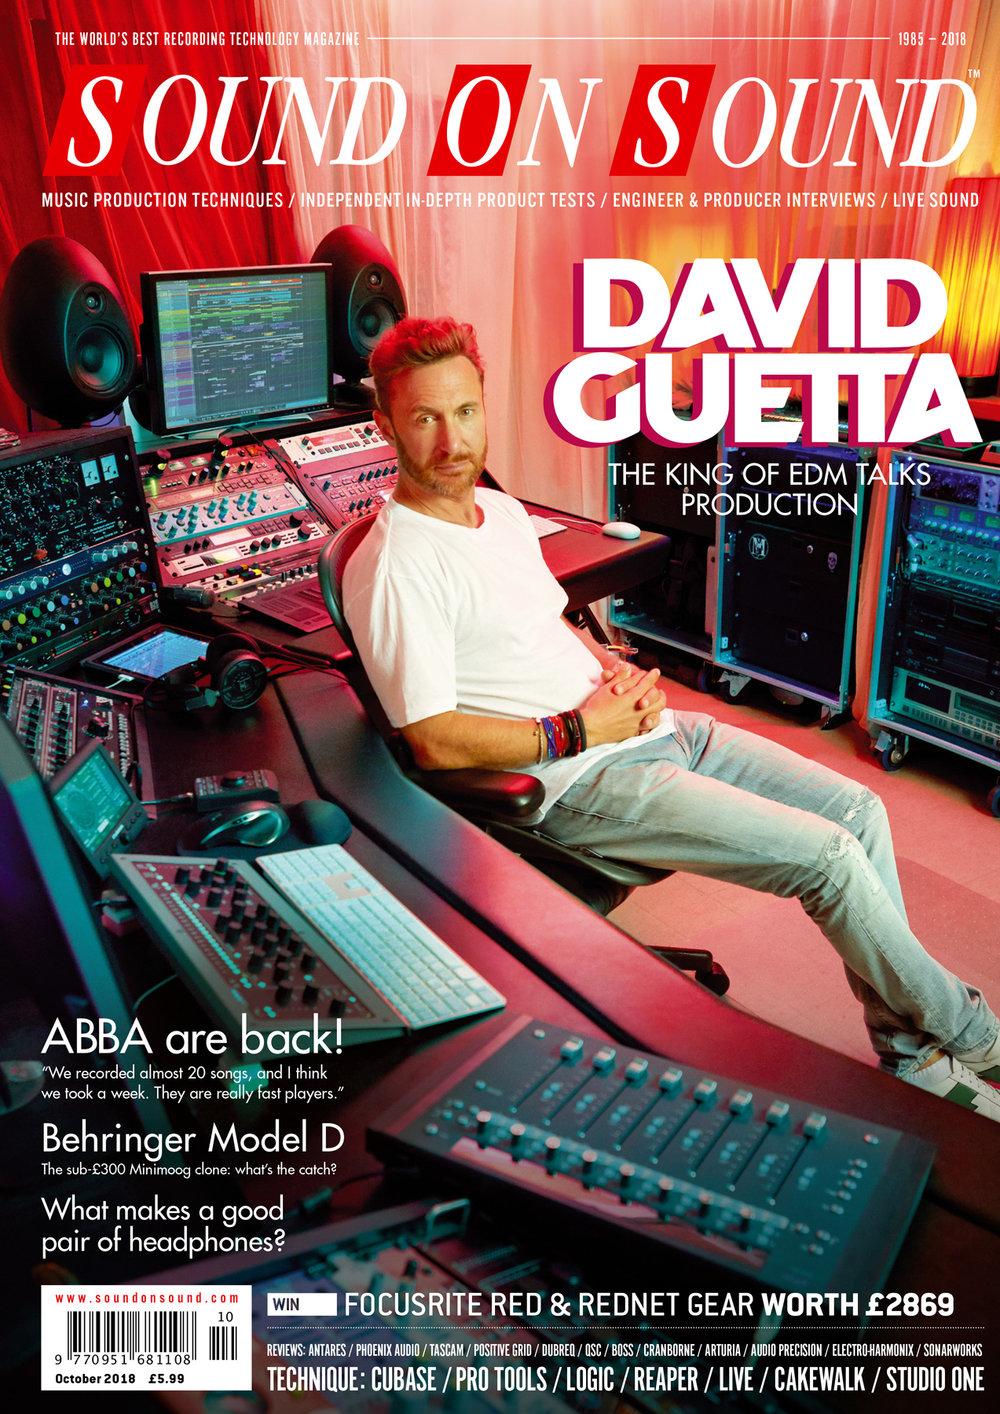 David_Guetta_Sound_On_Sound_Magazine_September_nachodorado_1.jpg